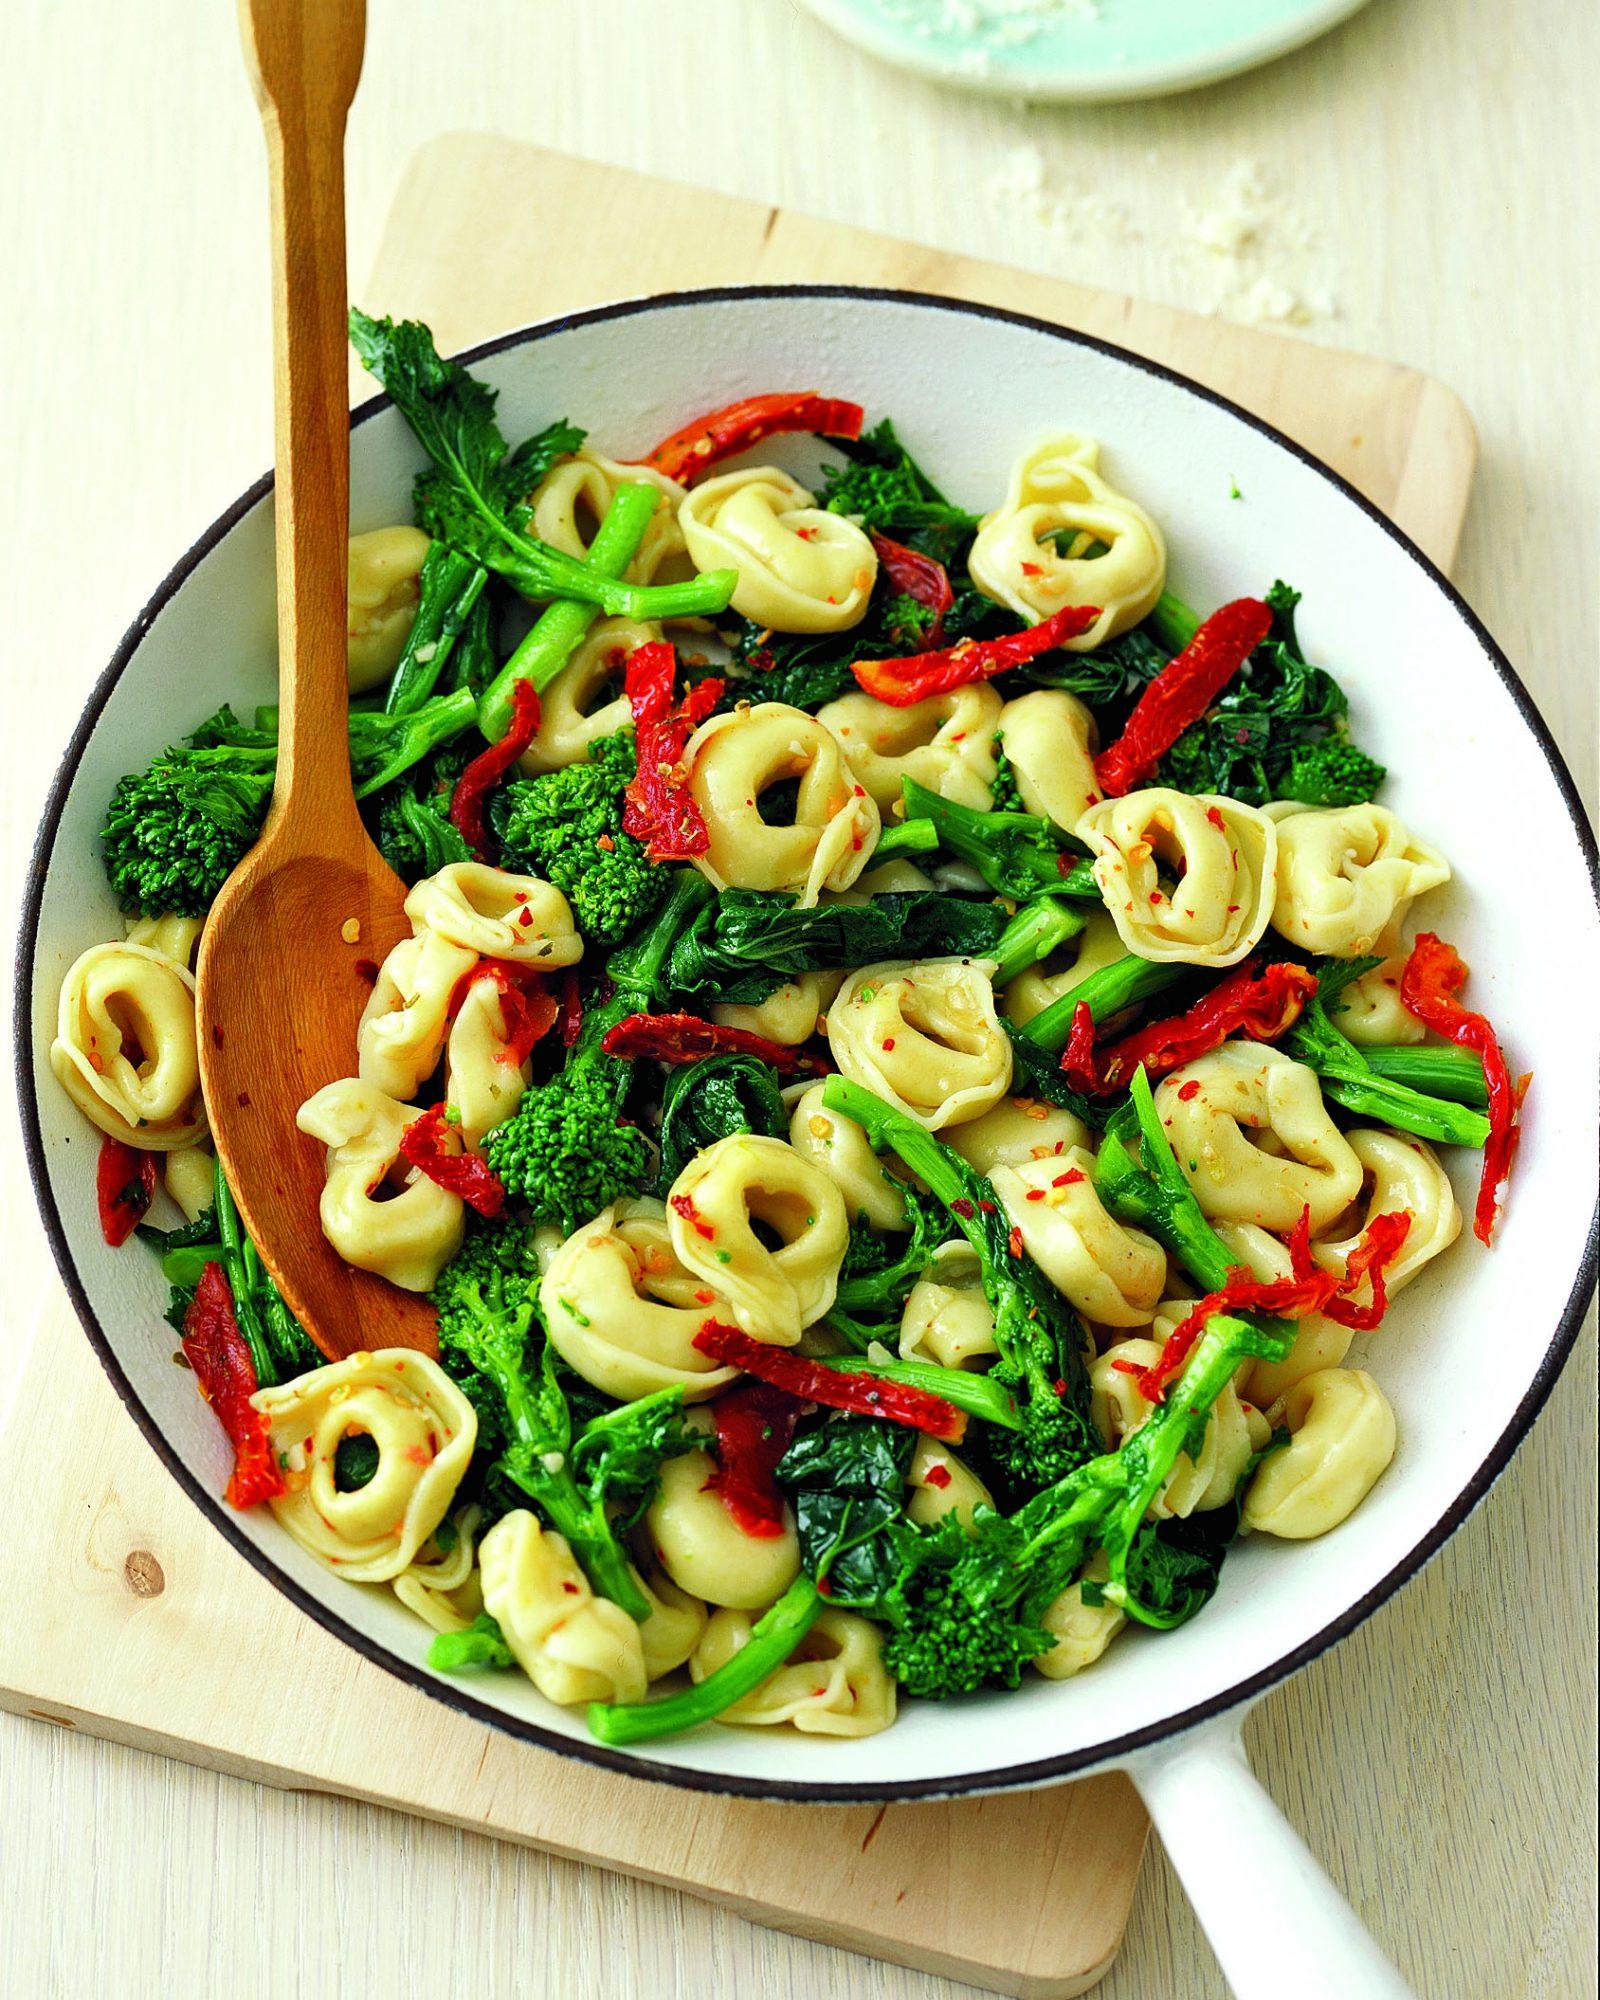 Chicken Tortellini with Broccoli Rabe